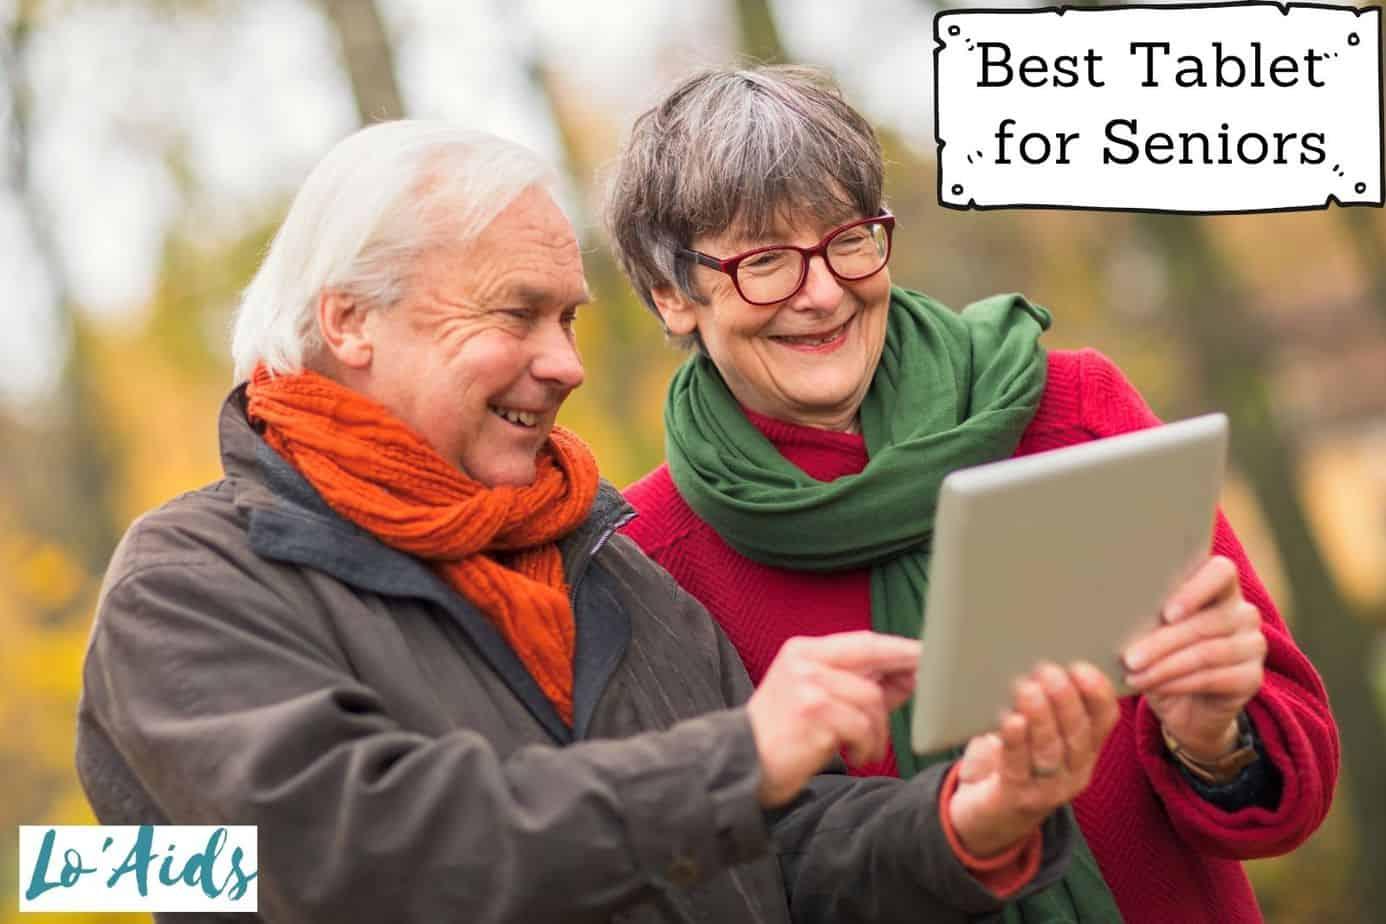 senior couple using their best tablets for seniors for video calling